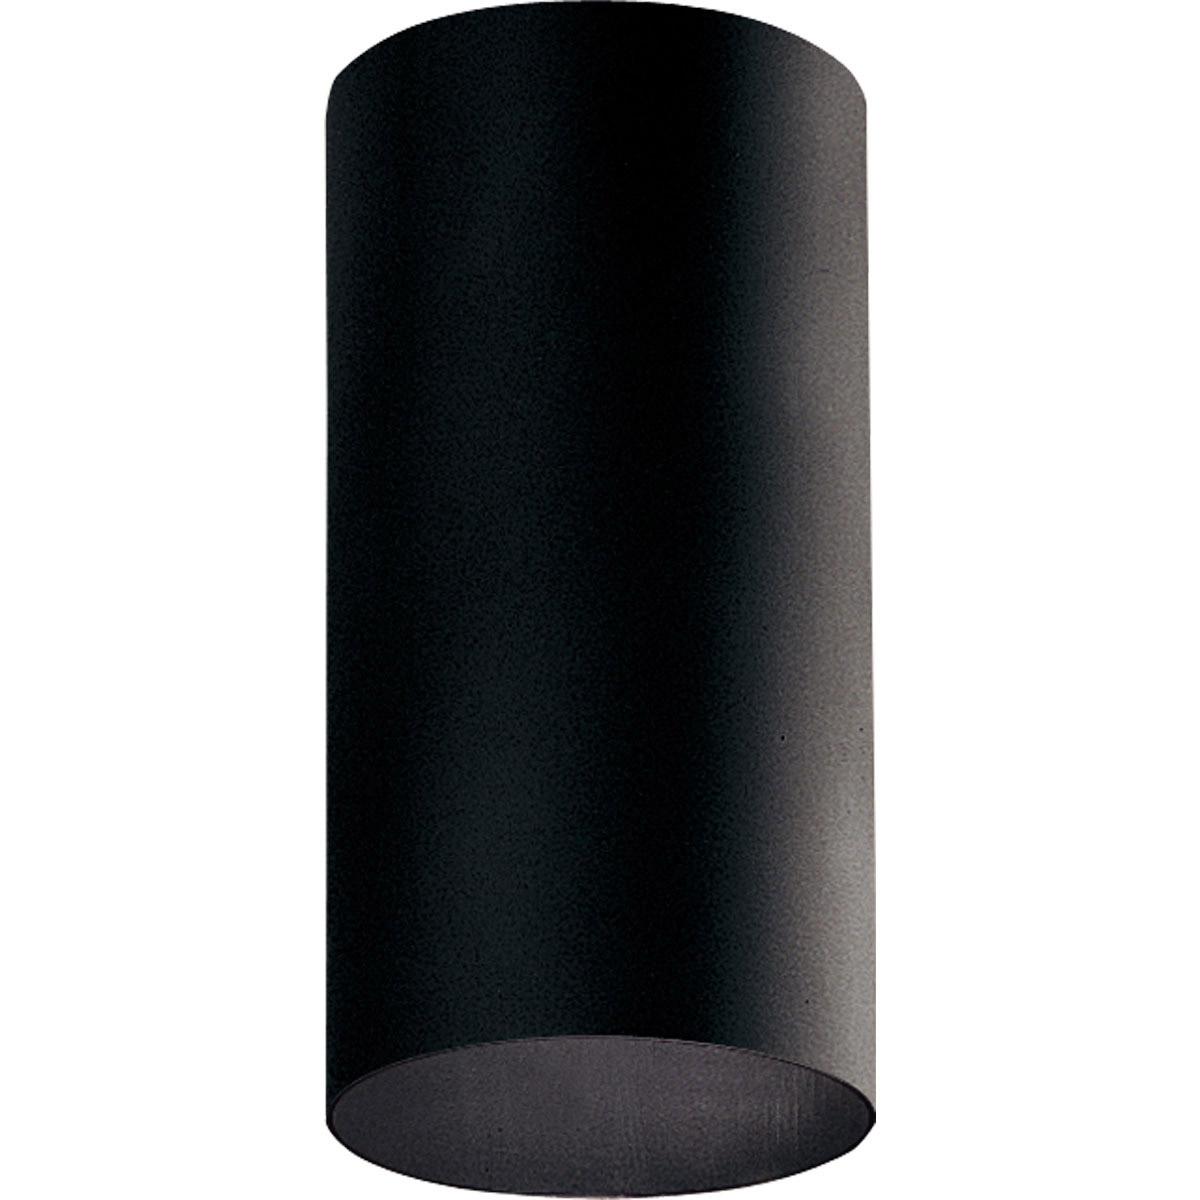 Progress Lighting P5741 31 Cylinder Outdoor Flush Mount